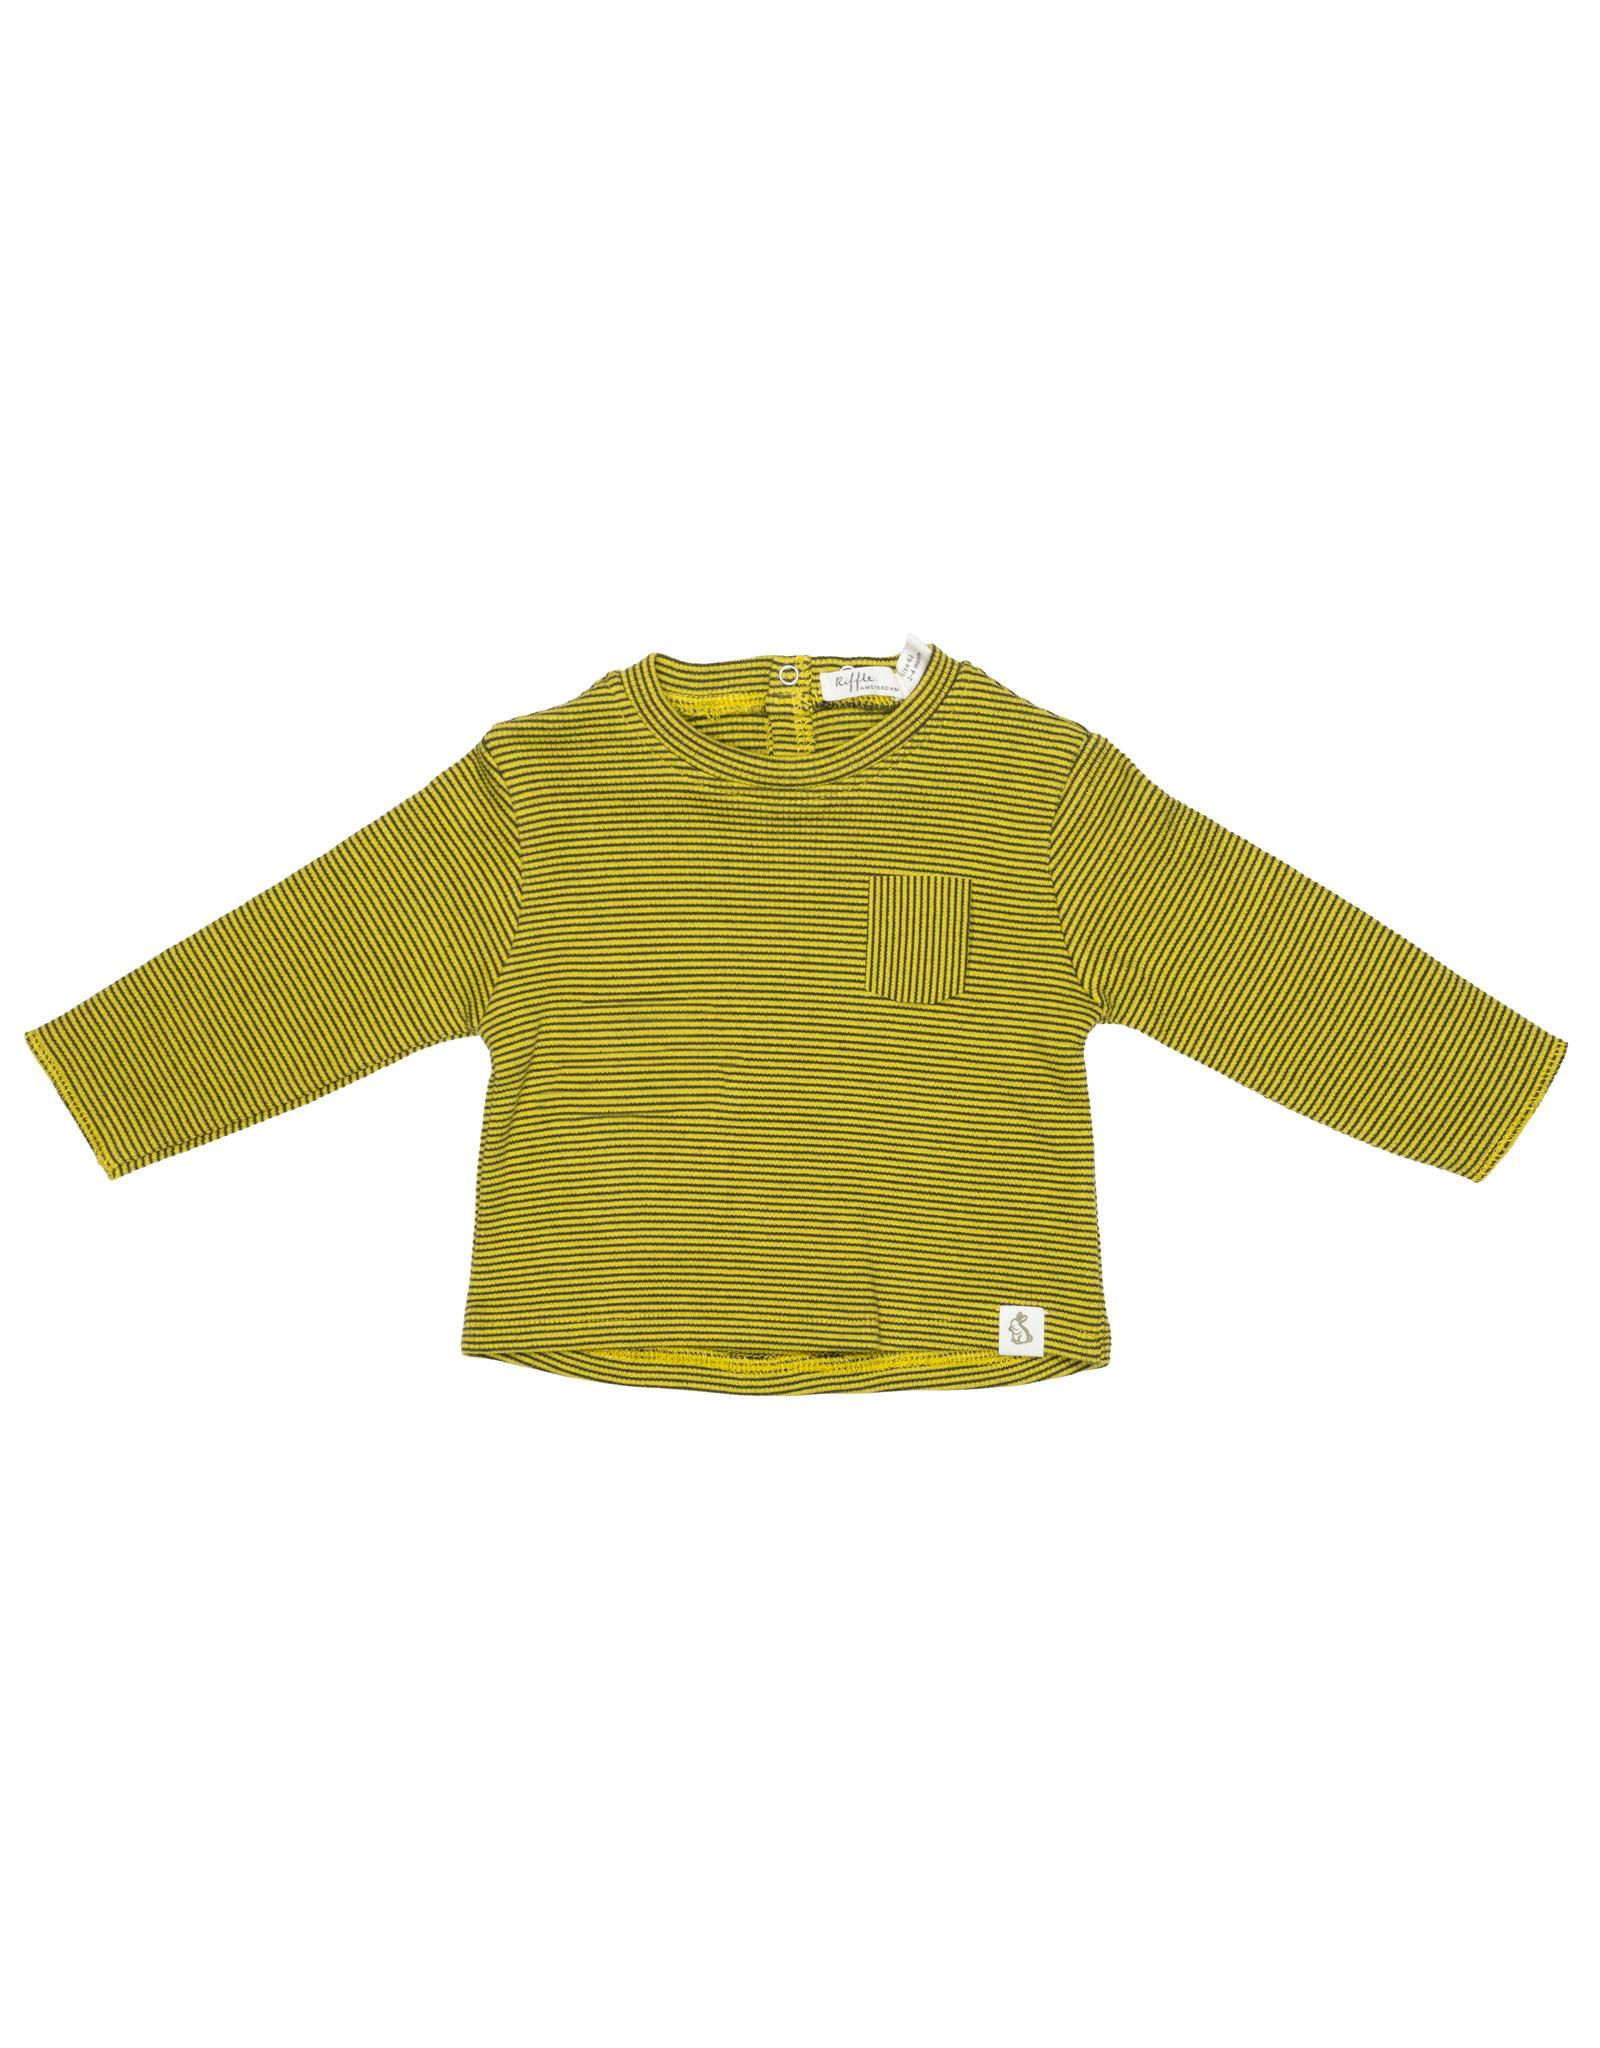 Riffle Amsterdam Riffle Amsterdam T-shirt Stripe Forest